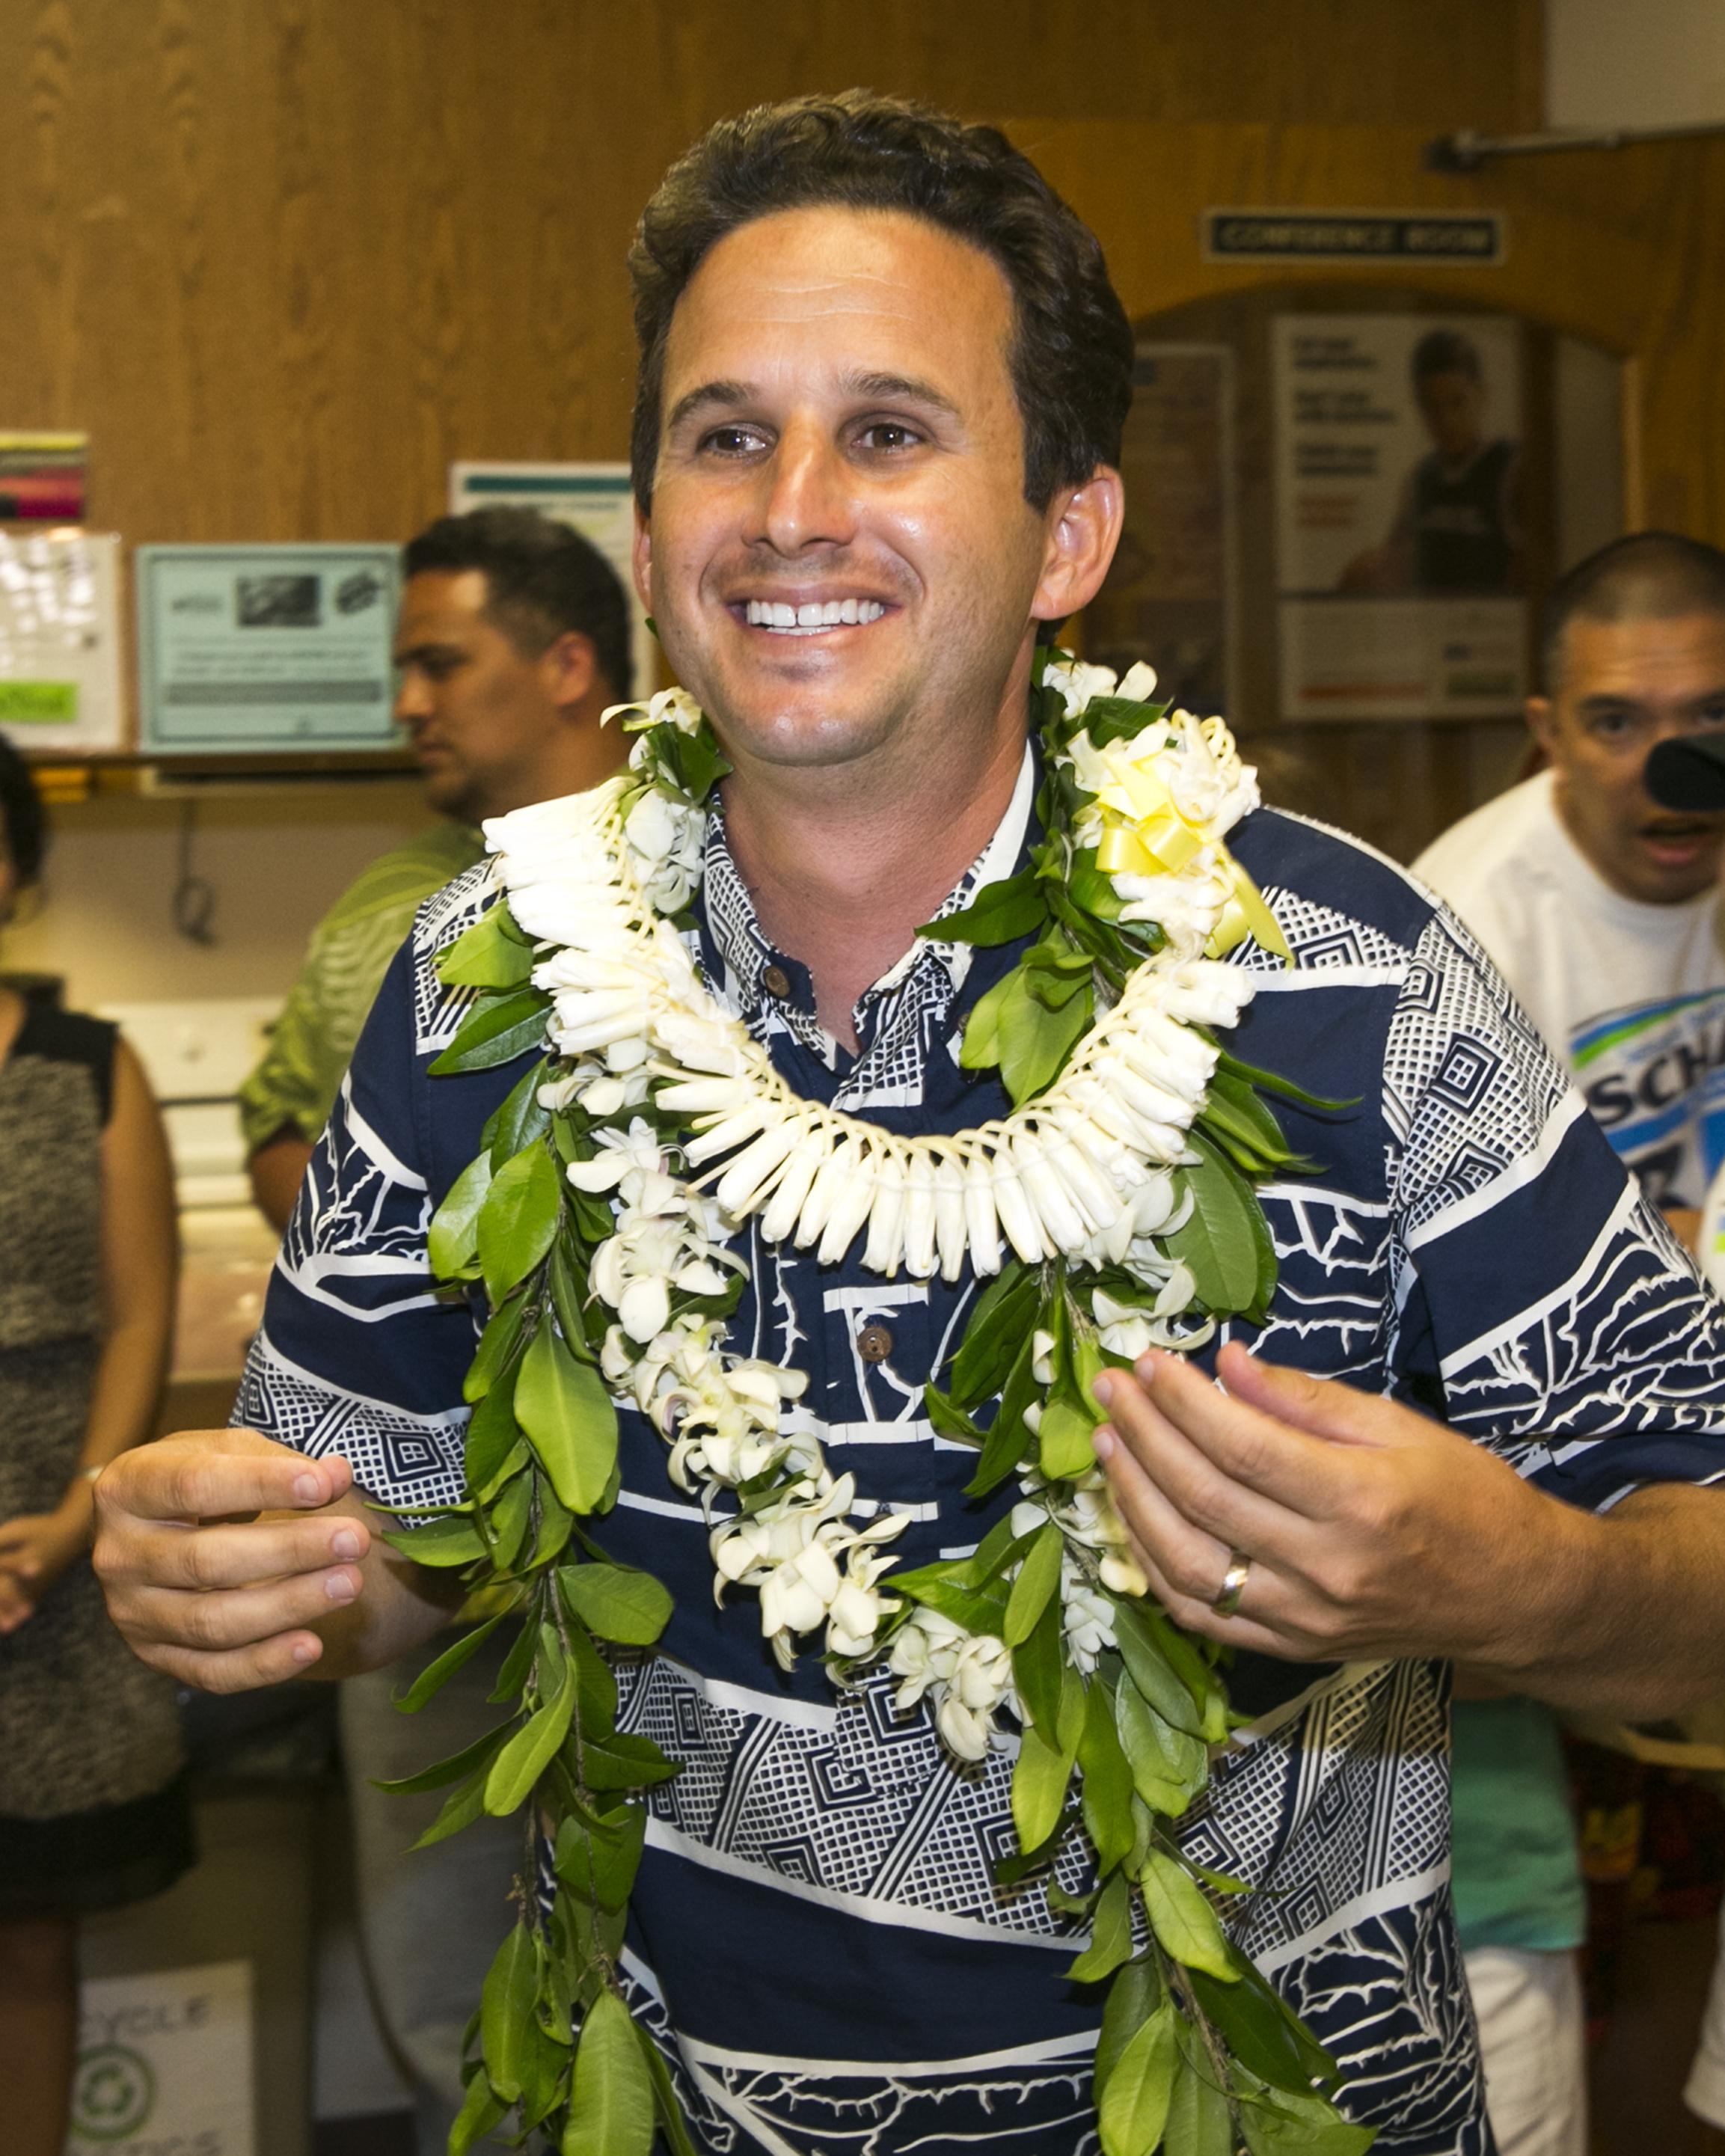 US Sen. Brian Schatz celebrates after defeating fellow Democrat Colleen Hanabusa to retain his senate seat on Aug. 15, 2014 in Hilo, Hawaii.